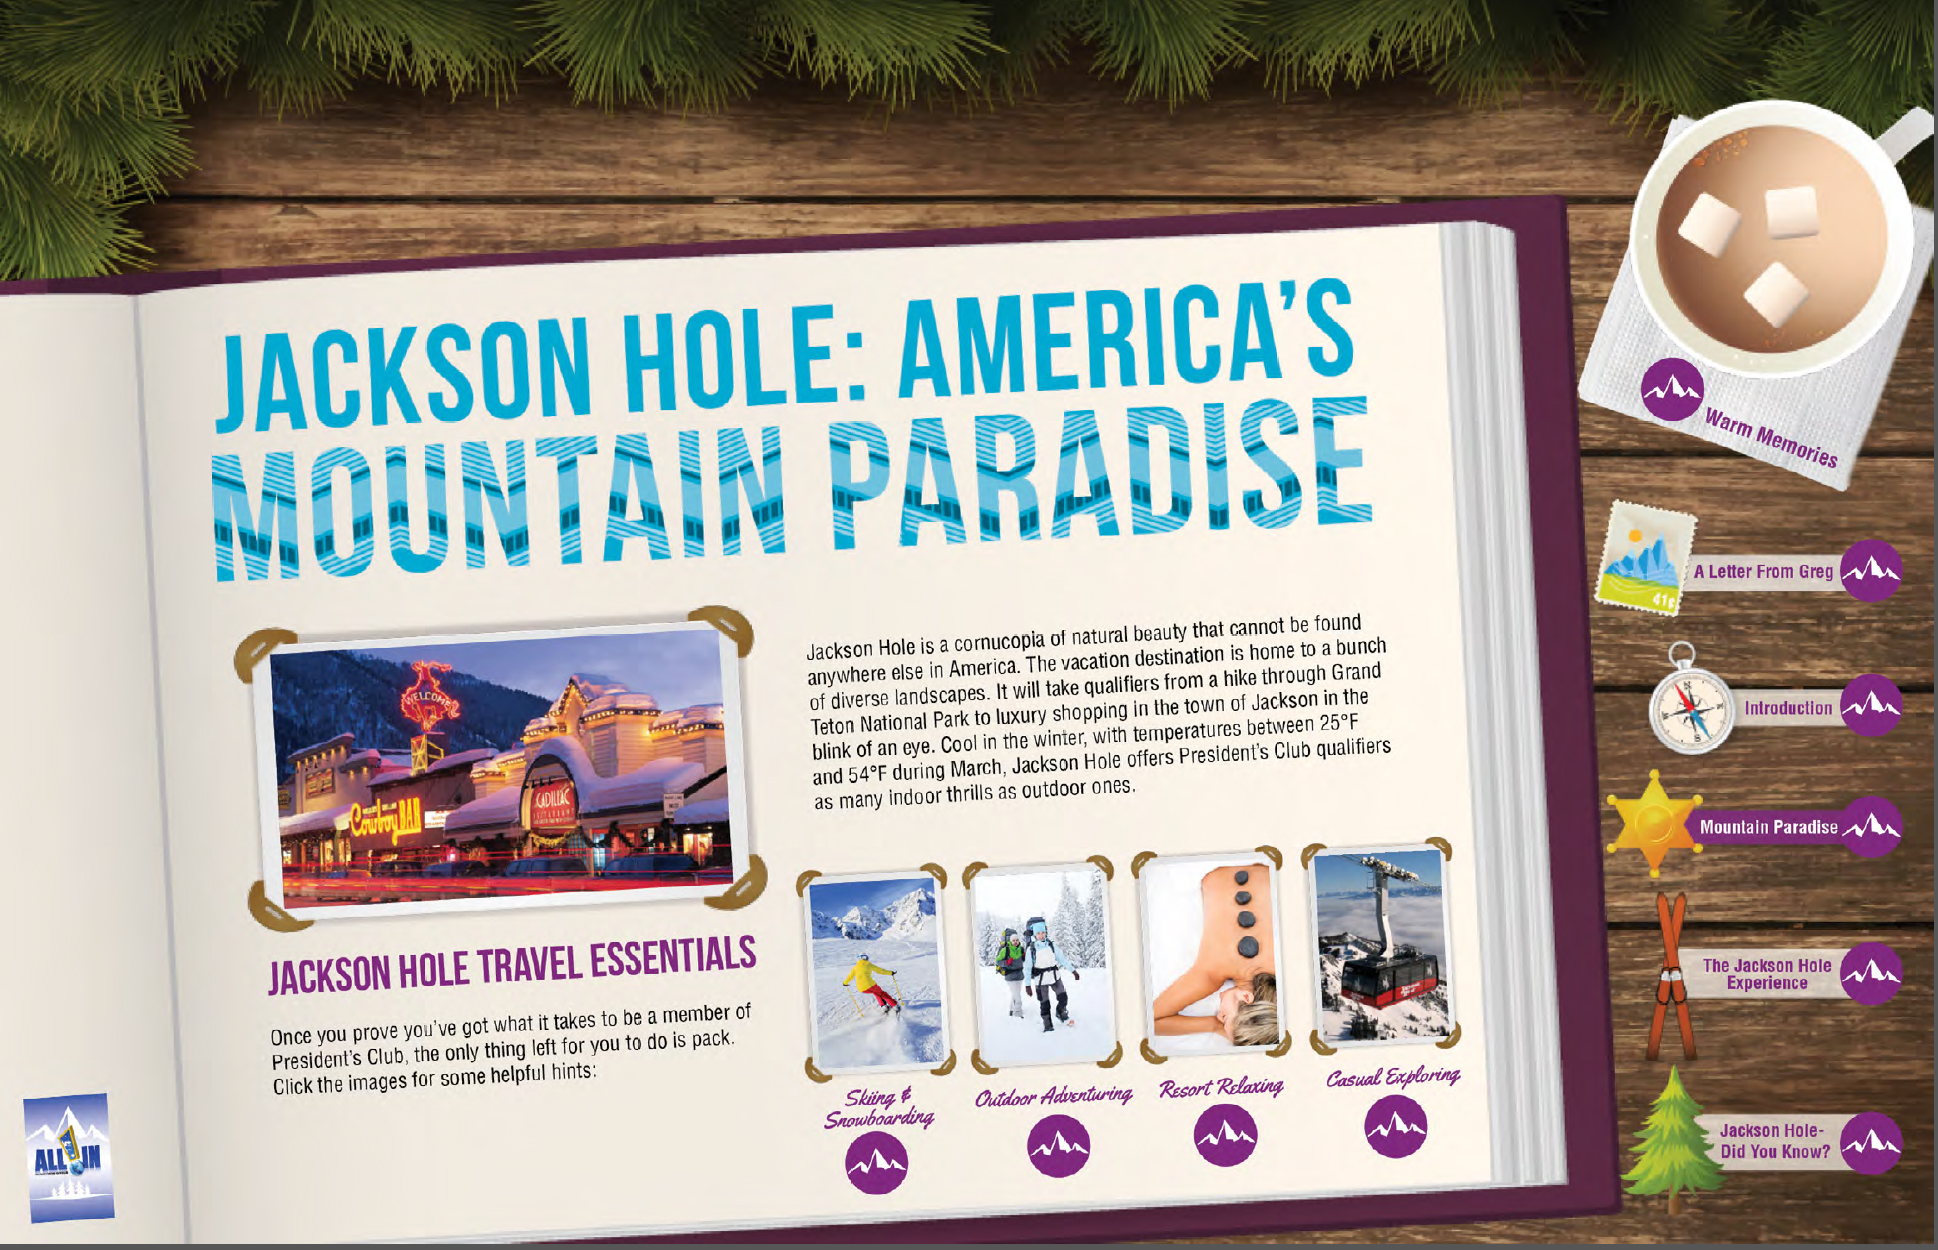 Jackson+hole+mountain+paradise.jpg